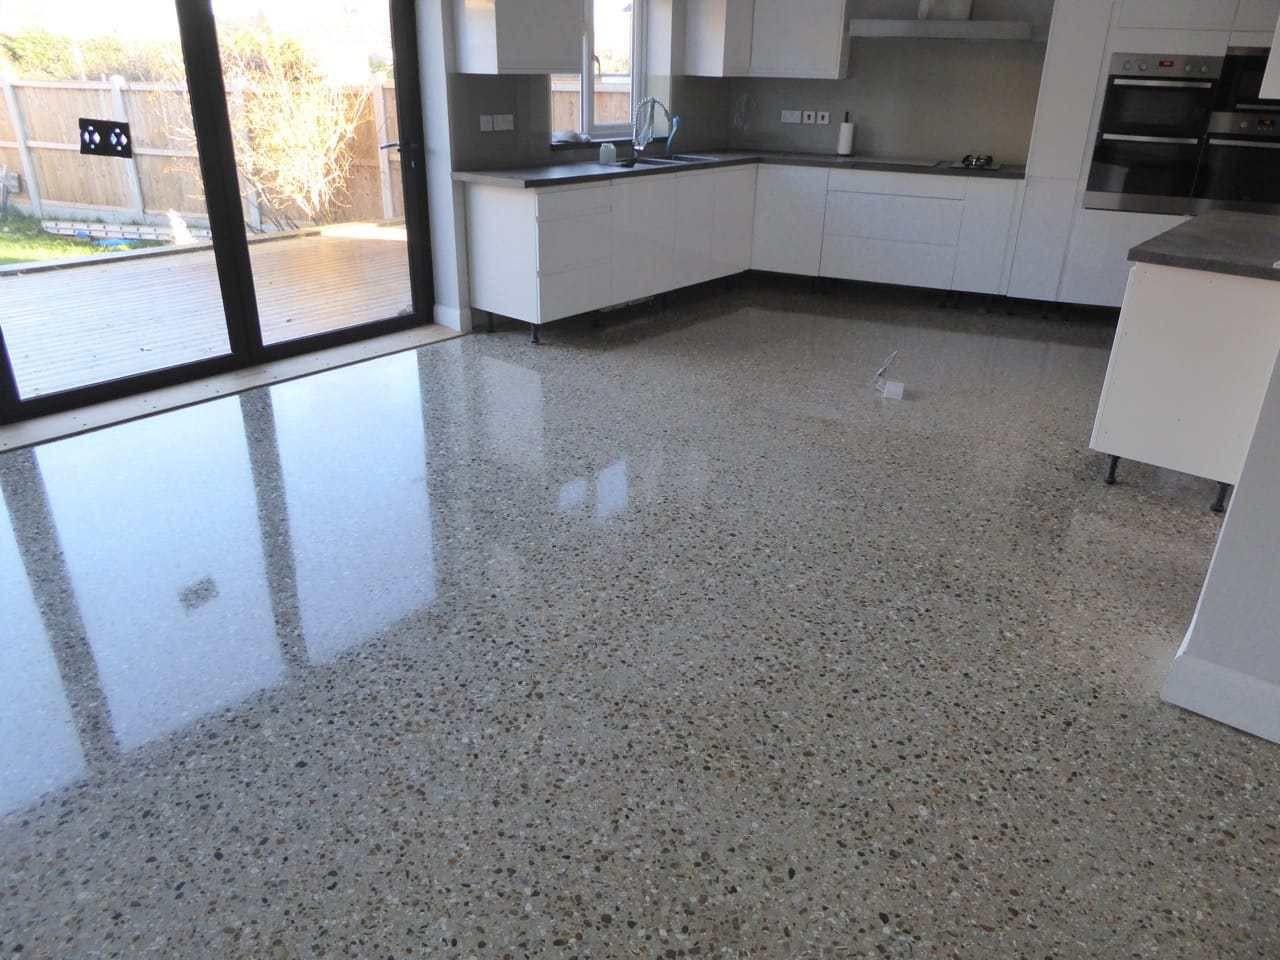 Best ideas about DIY Polished Concrete Floor . Save or Pin Polished Concrete Floors in 2019 Polished Concrete Now.